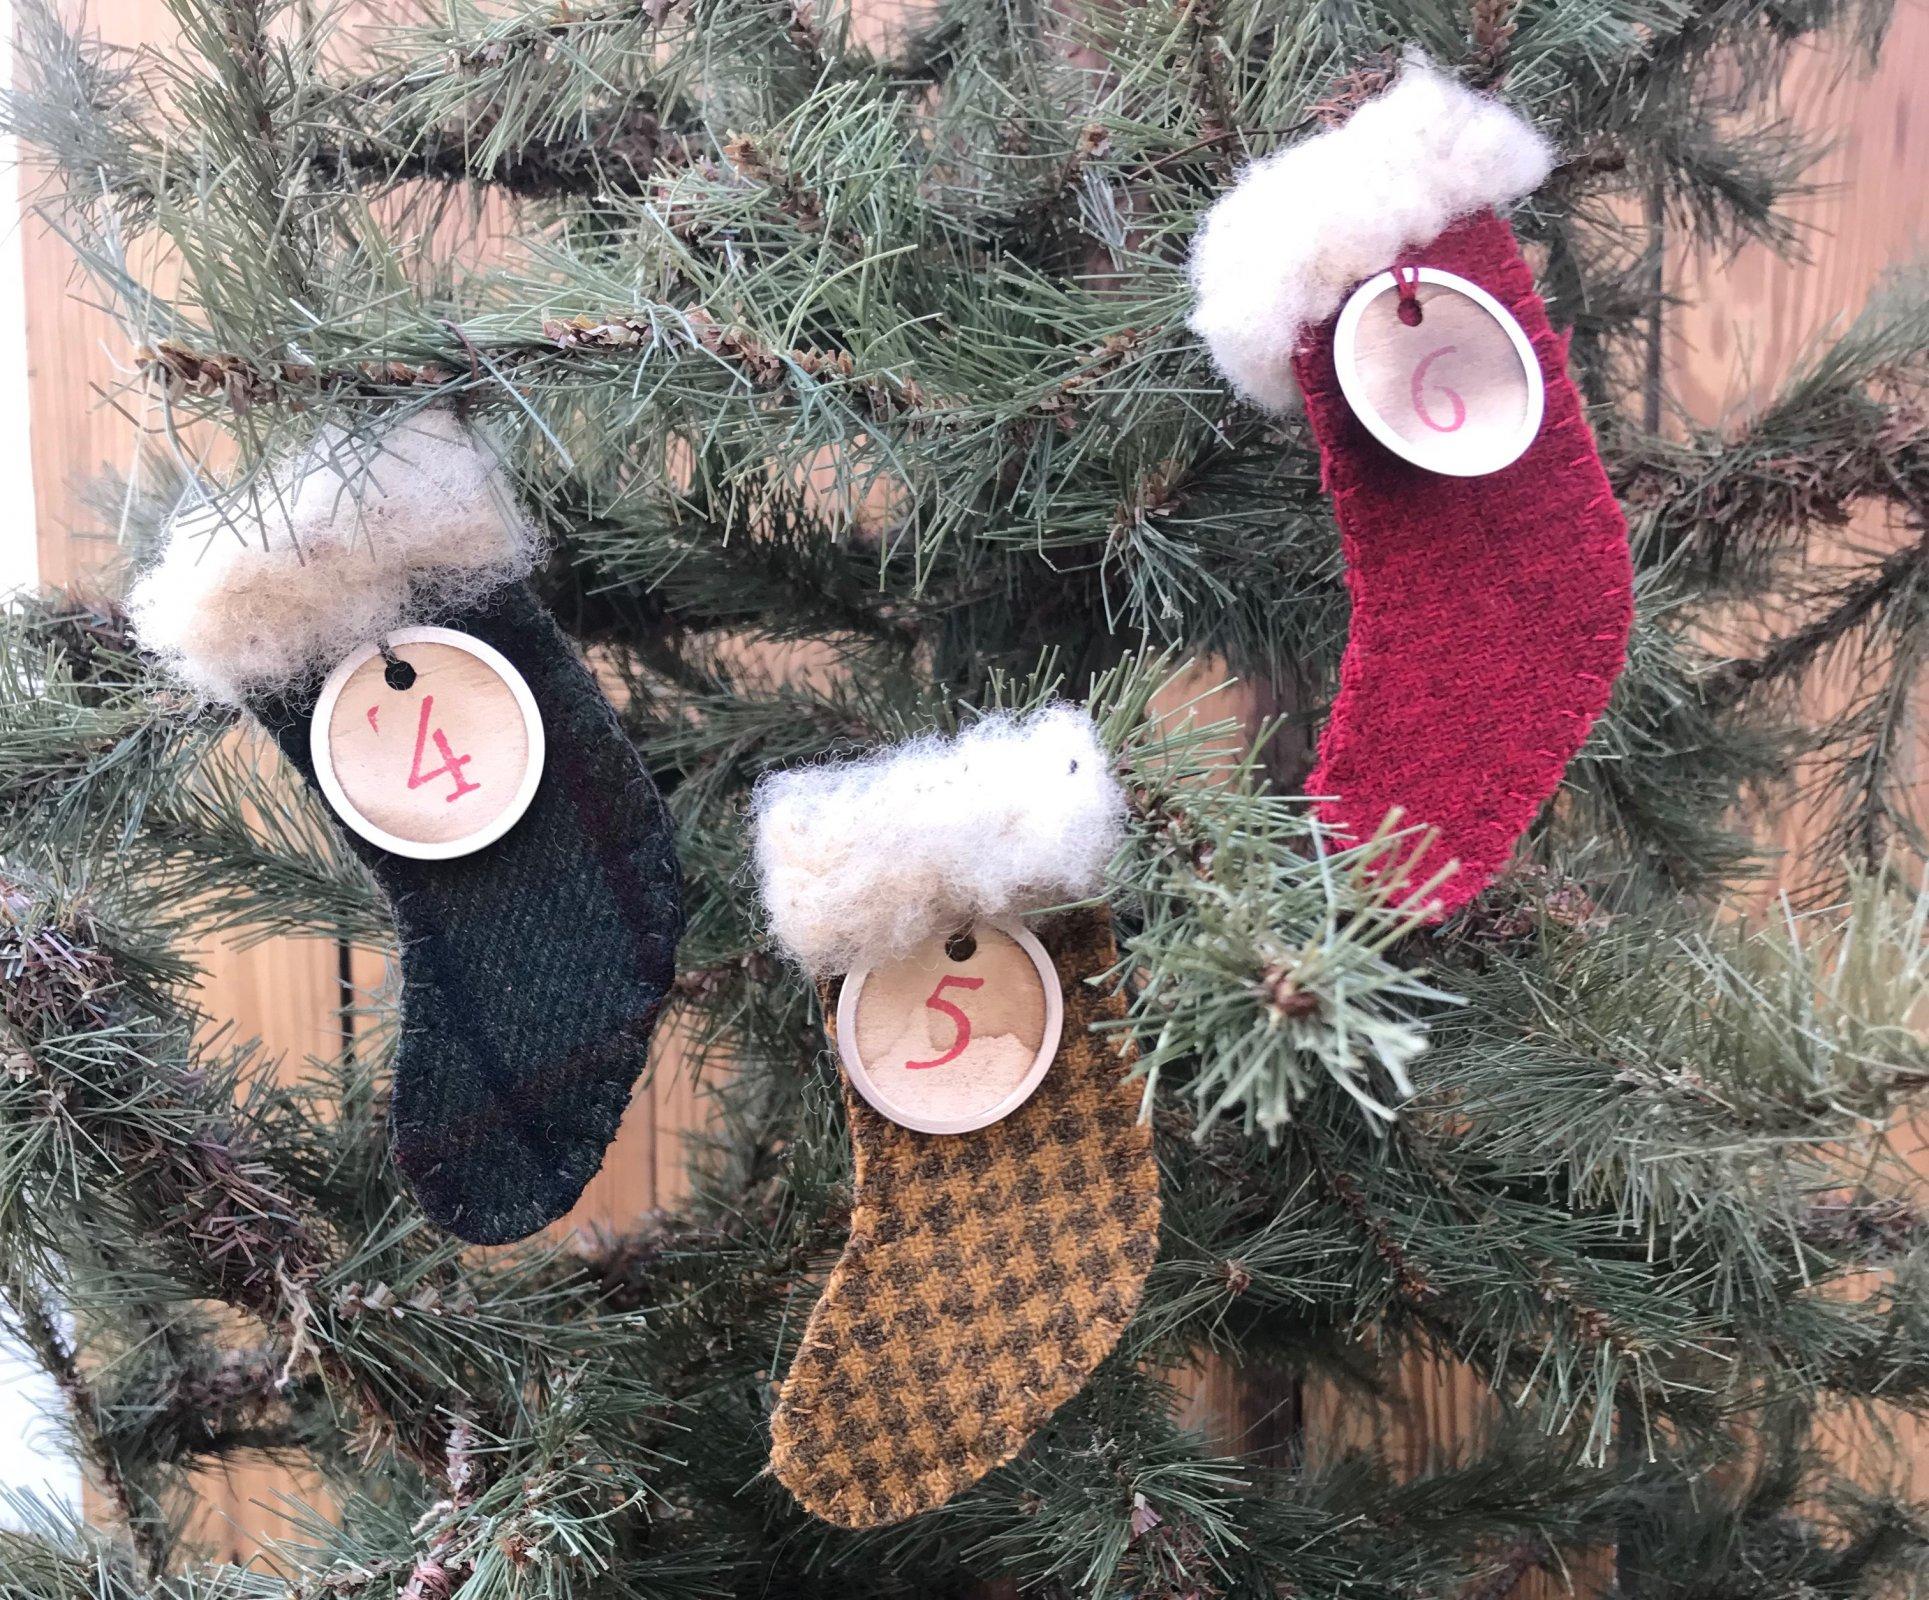 2018 Advent Stockings